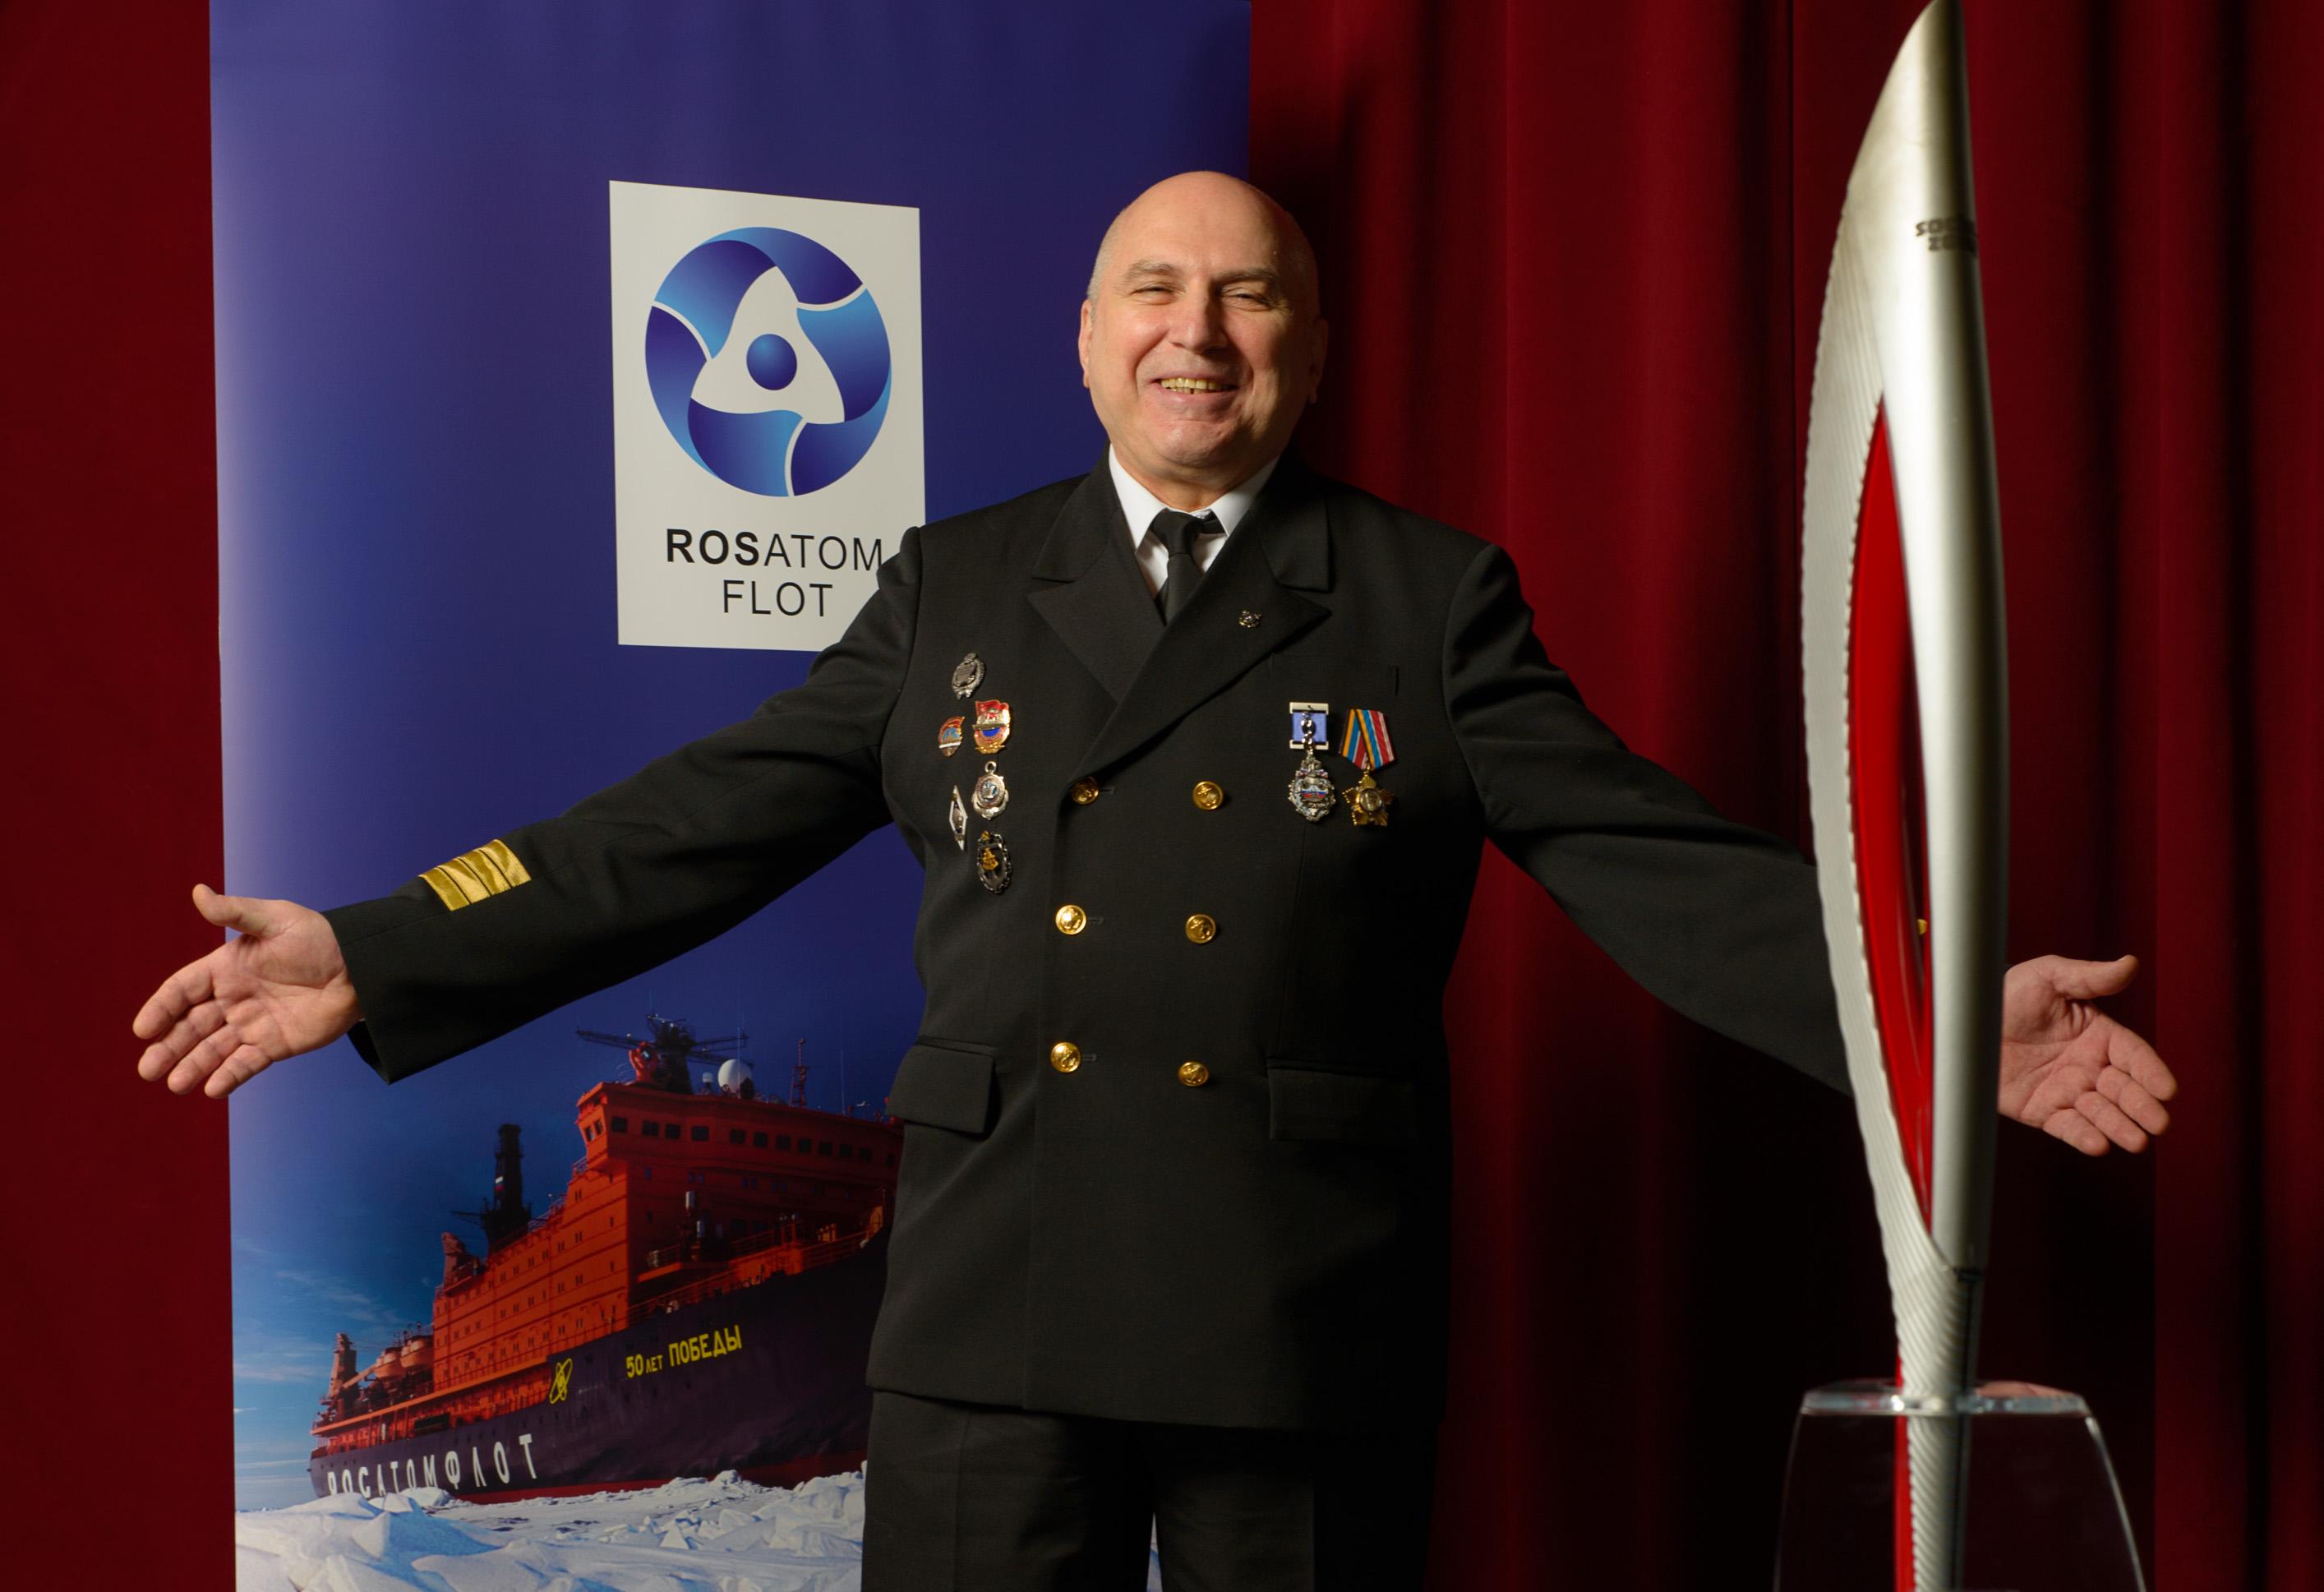 Oficiální pochodeň olympiády v Soči dorazila do Prahy